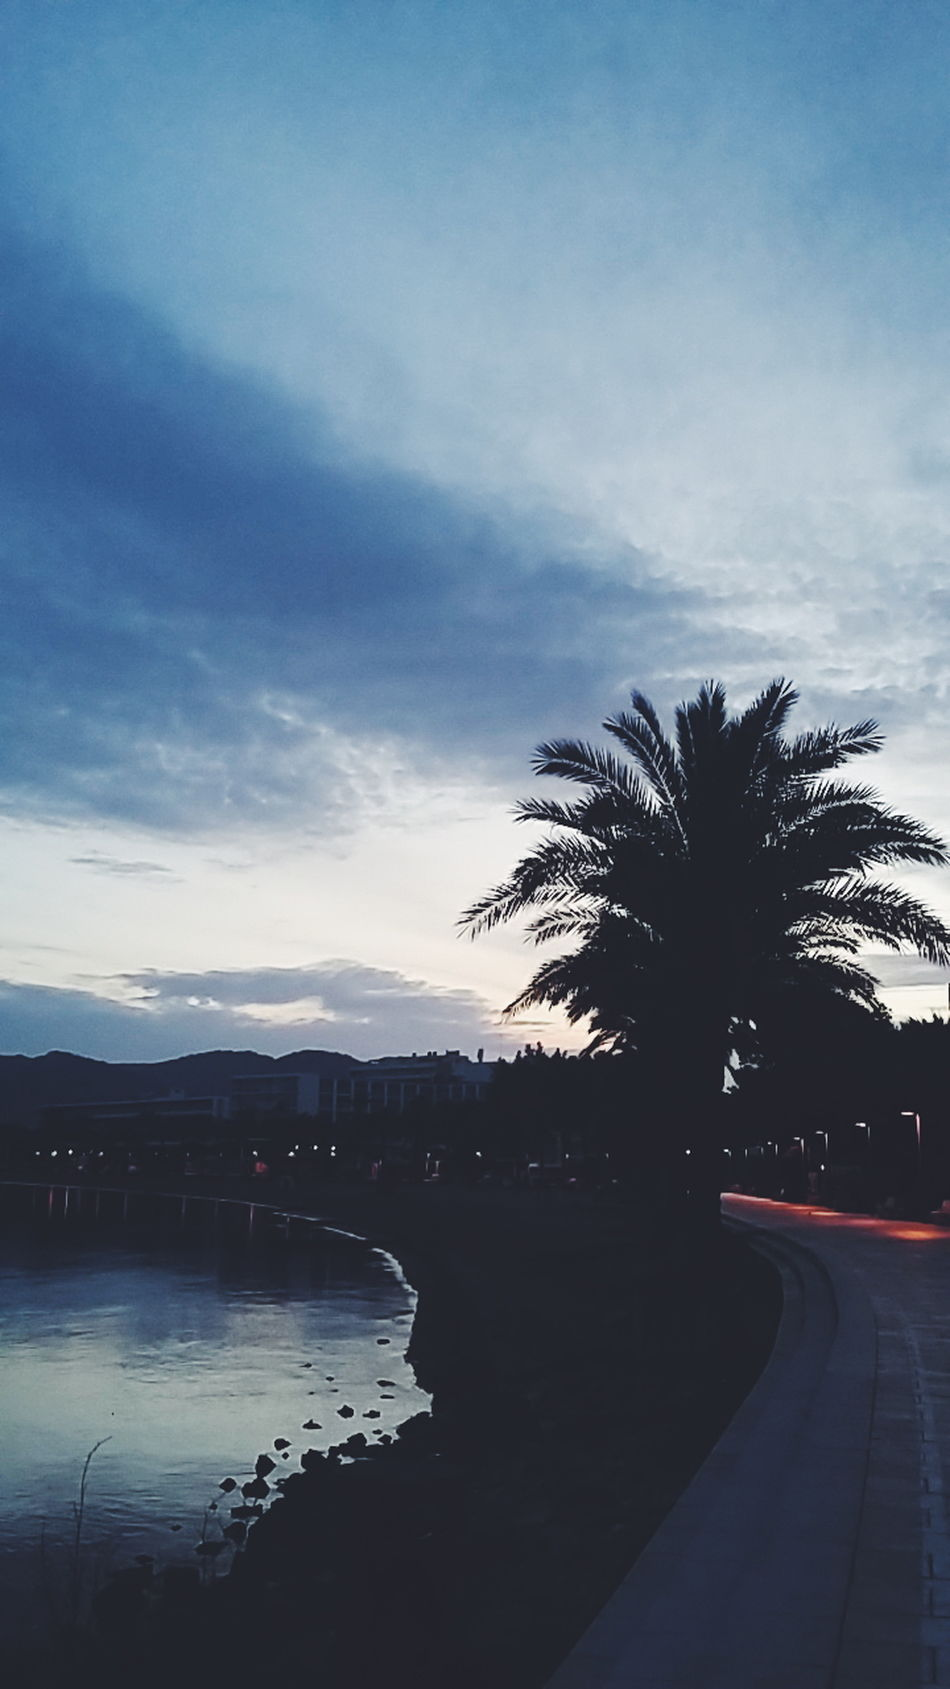 Ibiza Sant Antoni De Portmany Reflection Tree Sunset Water Sky Outdoors Nature No People Day